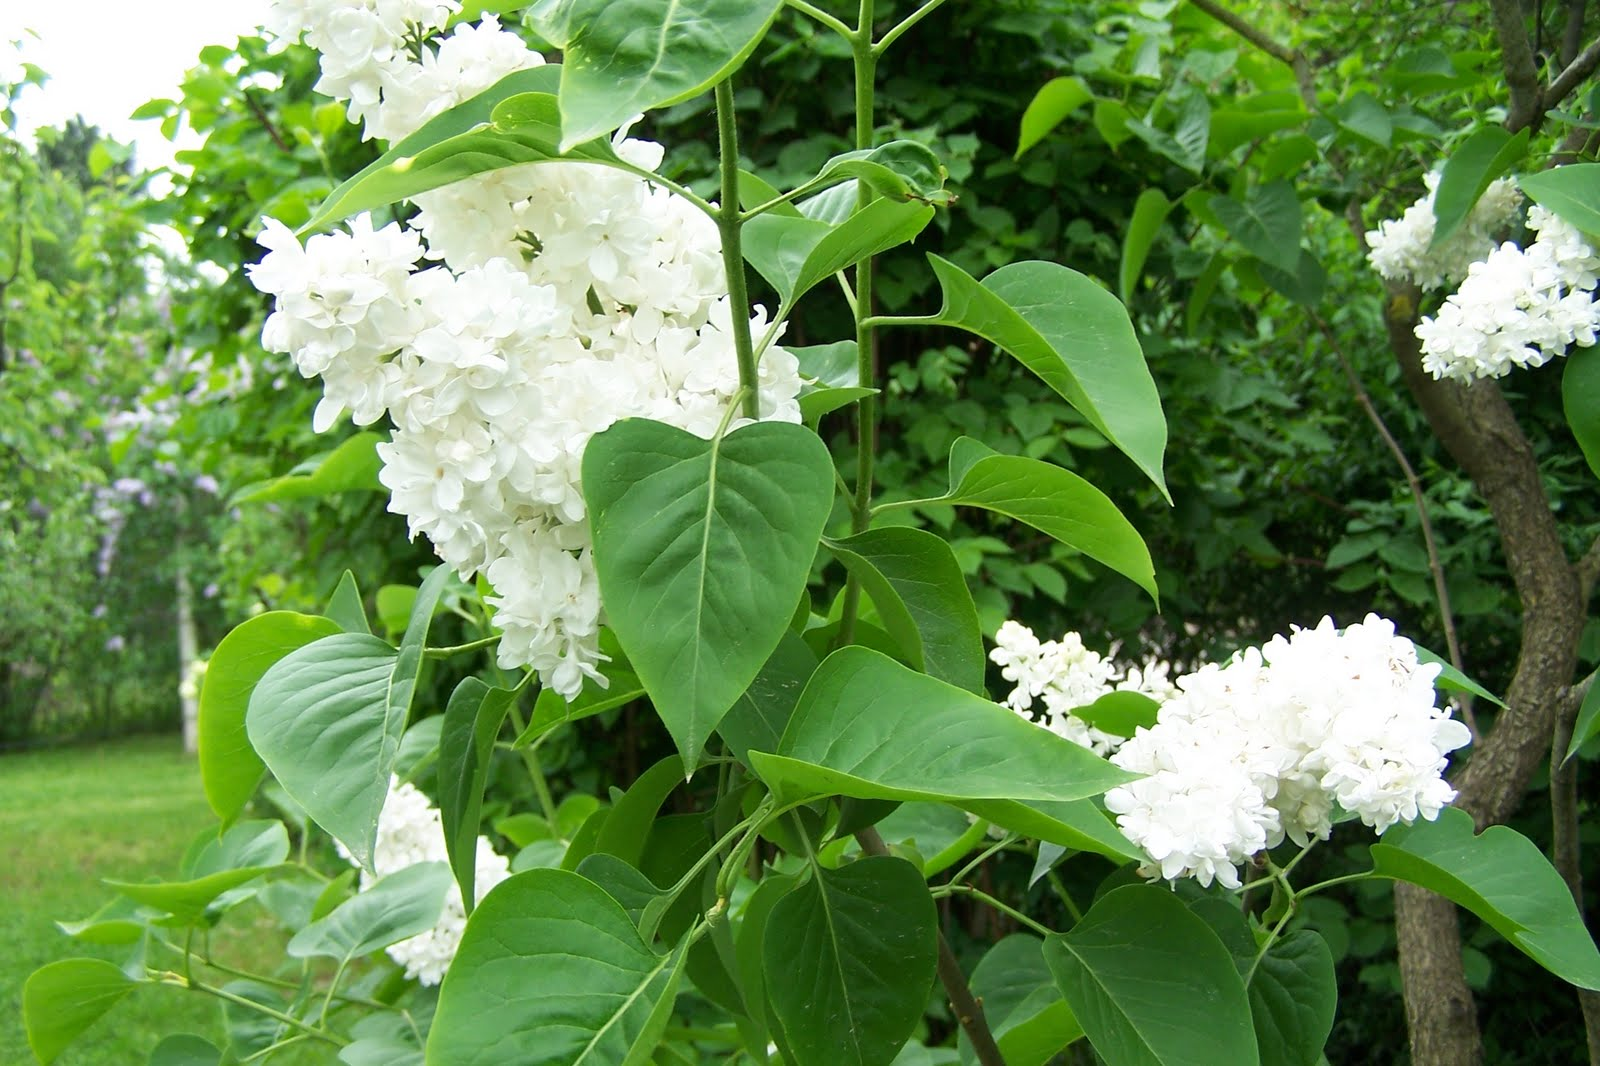 Arbusto selvatico fiori bianchi profumati immagini - Fiori gialli profumati ...